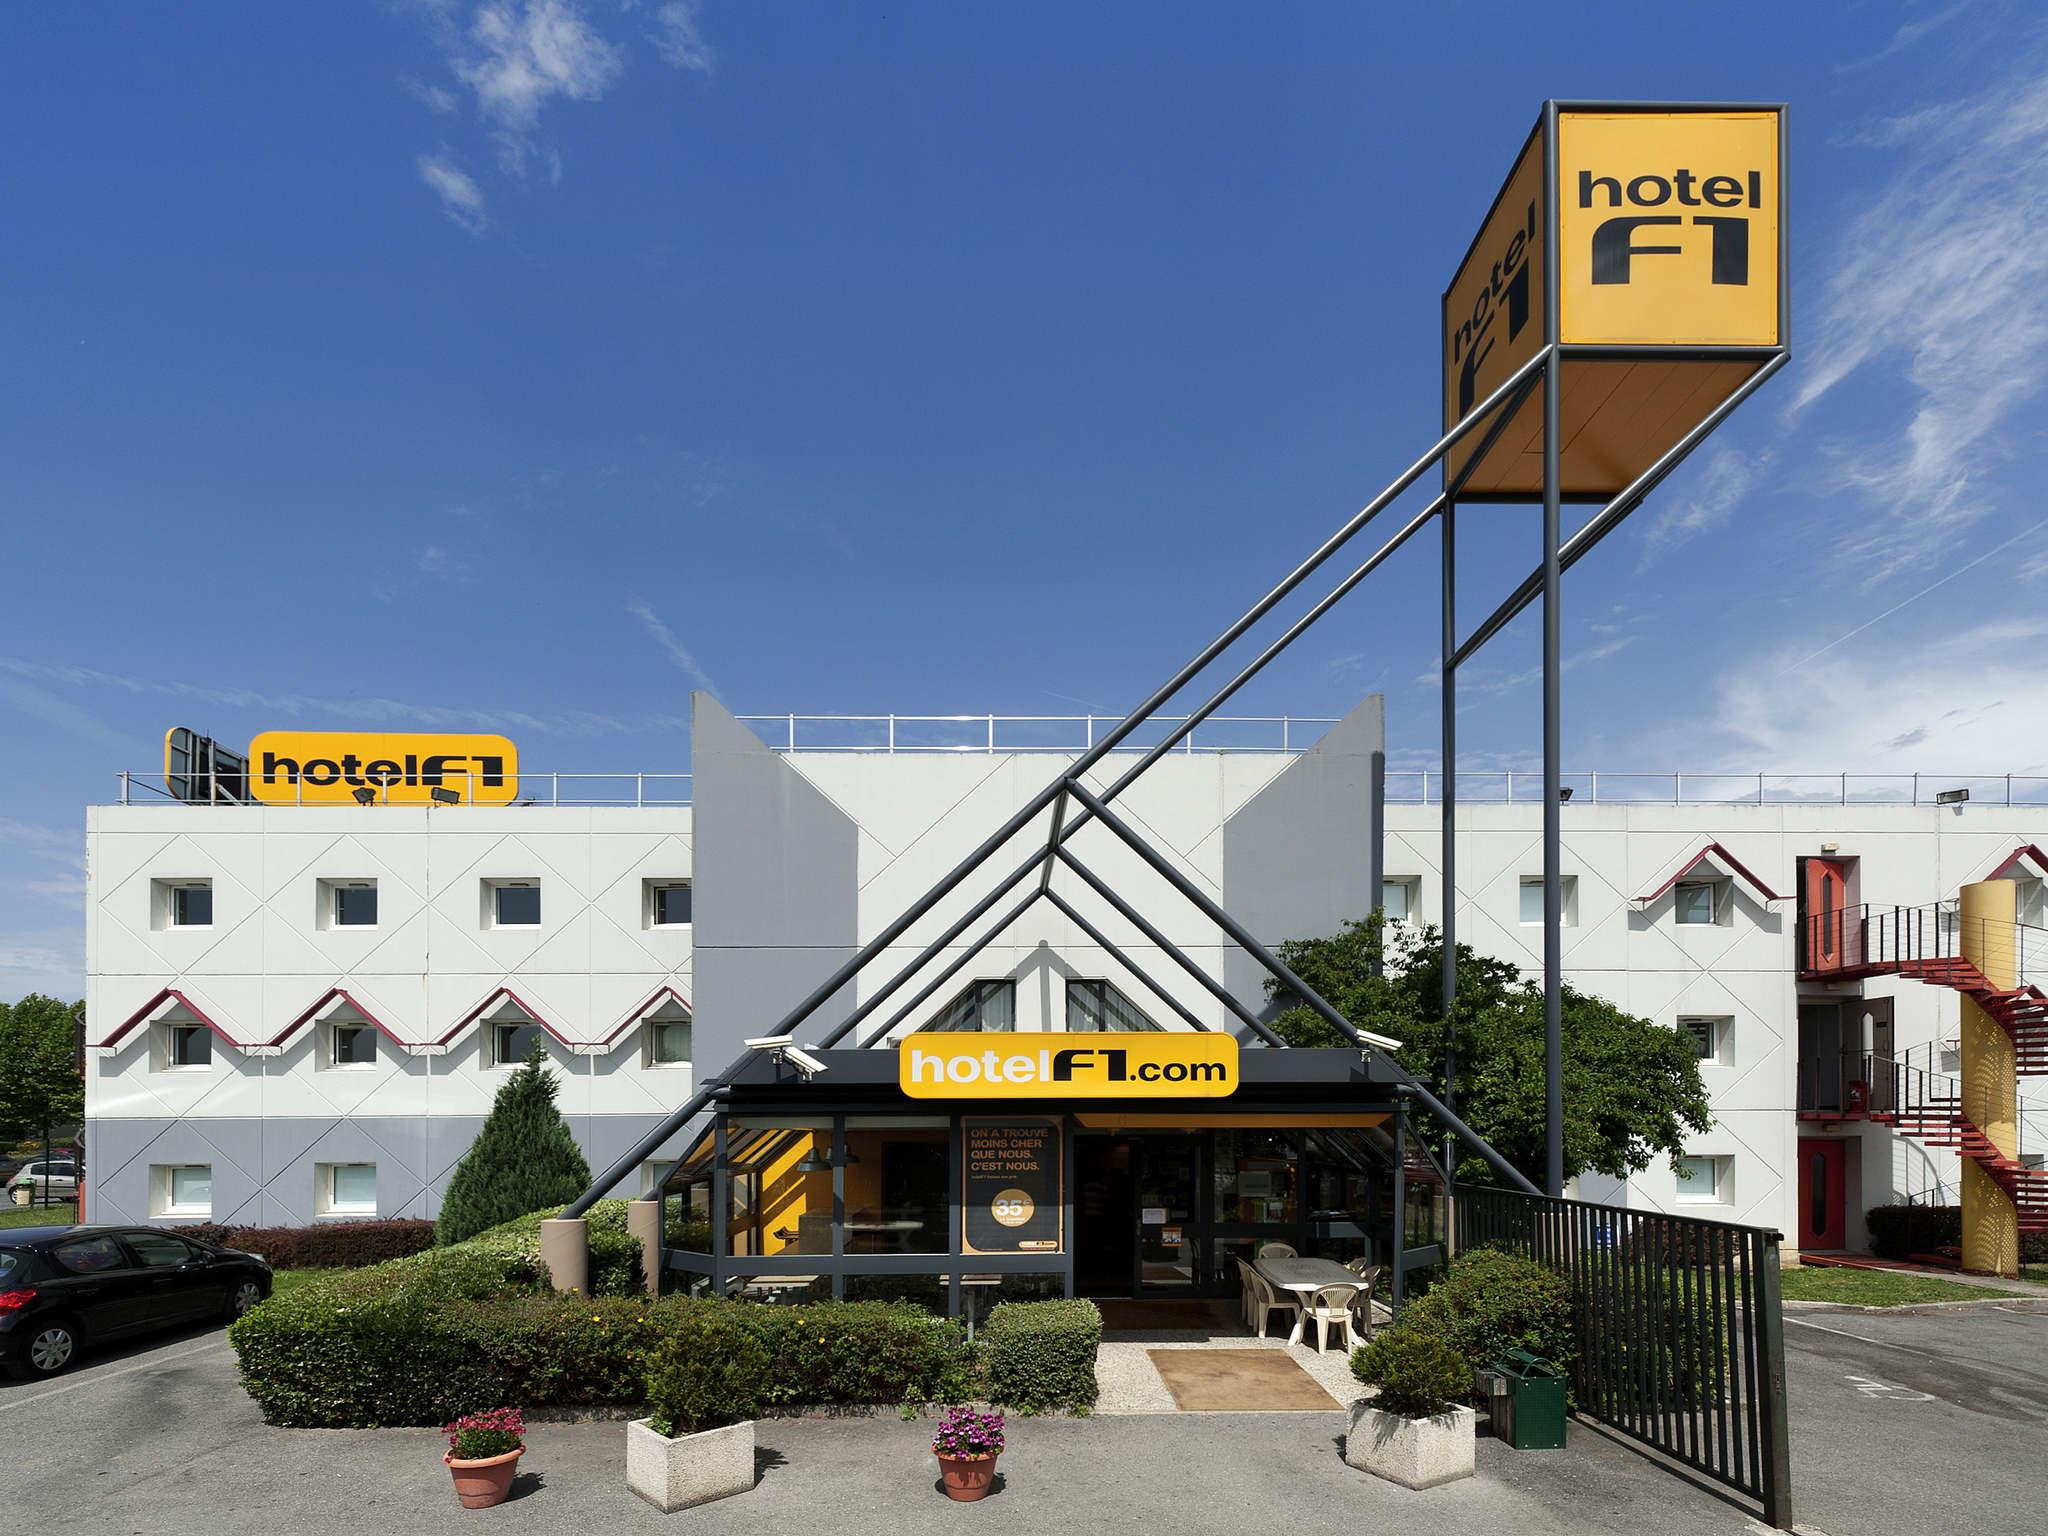 فندق - hotelF1 Mennecy